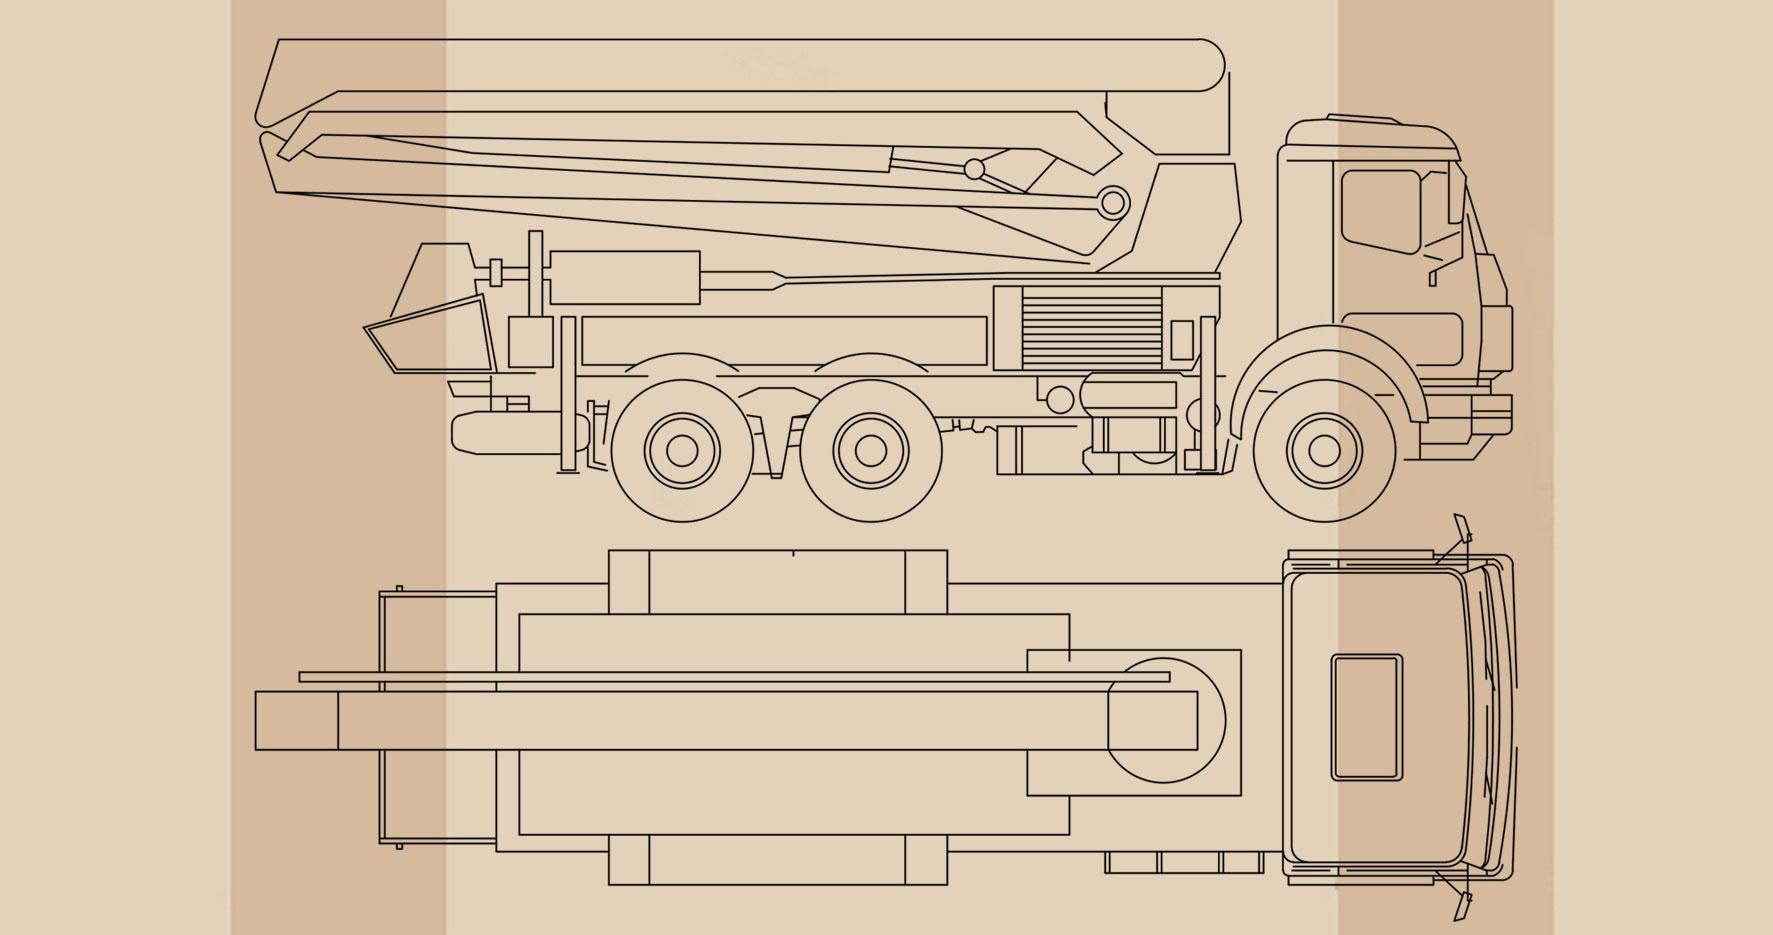 dwg انواع ماشین سنگین فایل